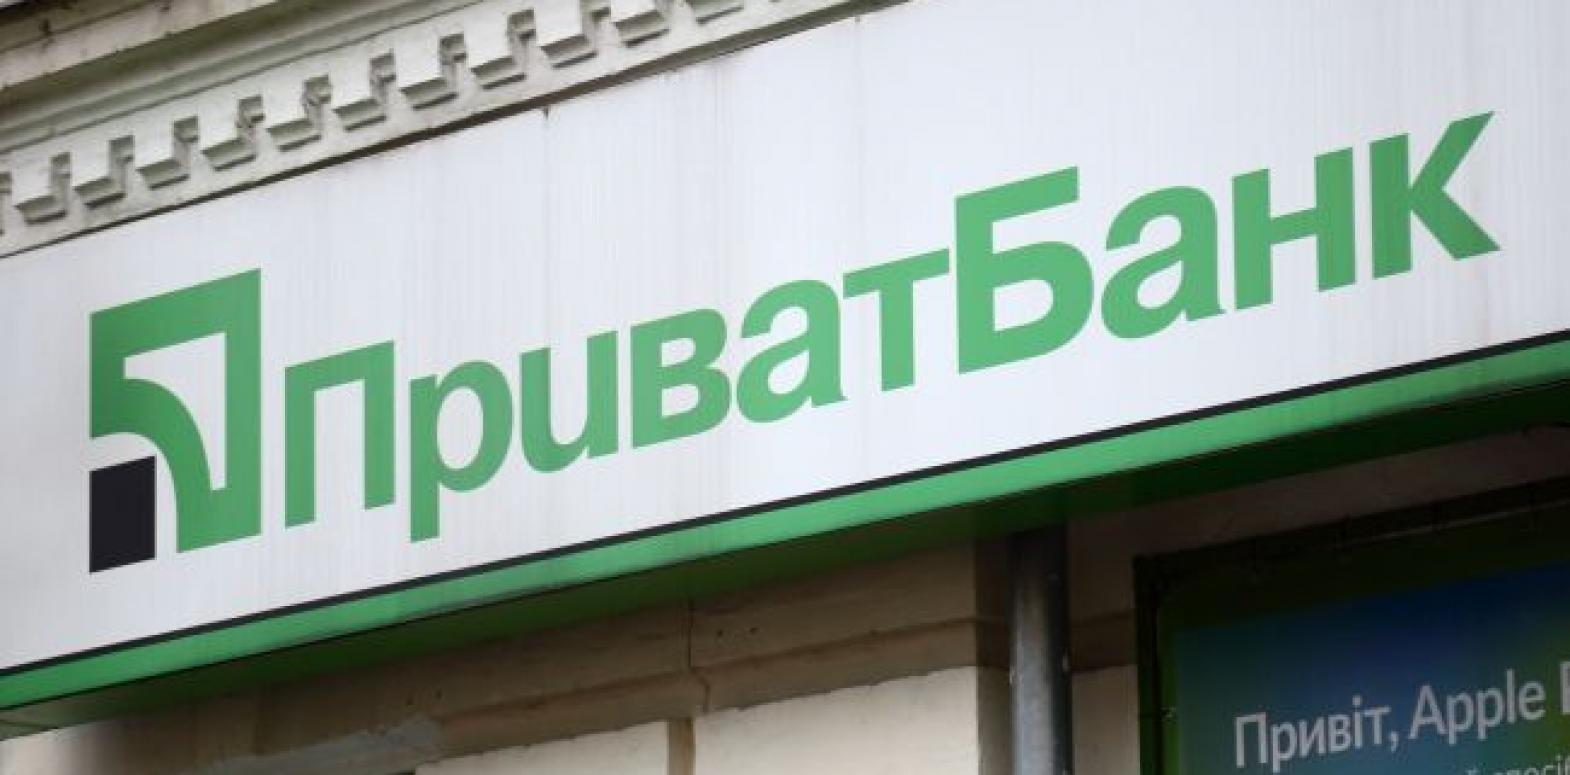 Суд назначил дату апелляции по делу о национализации ПриватБанка